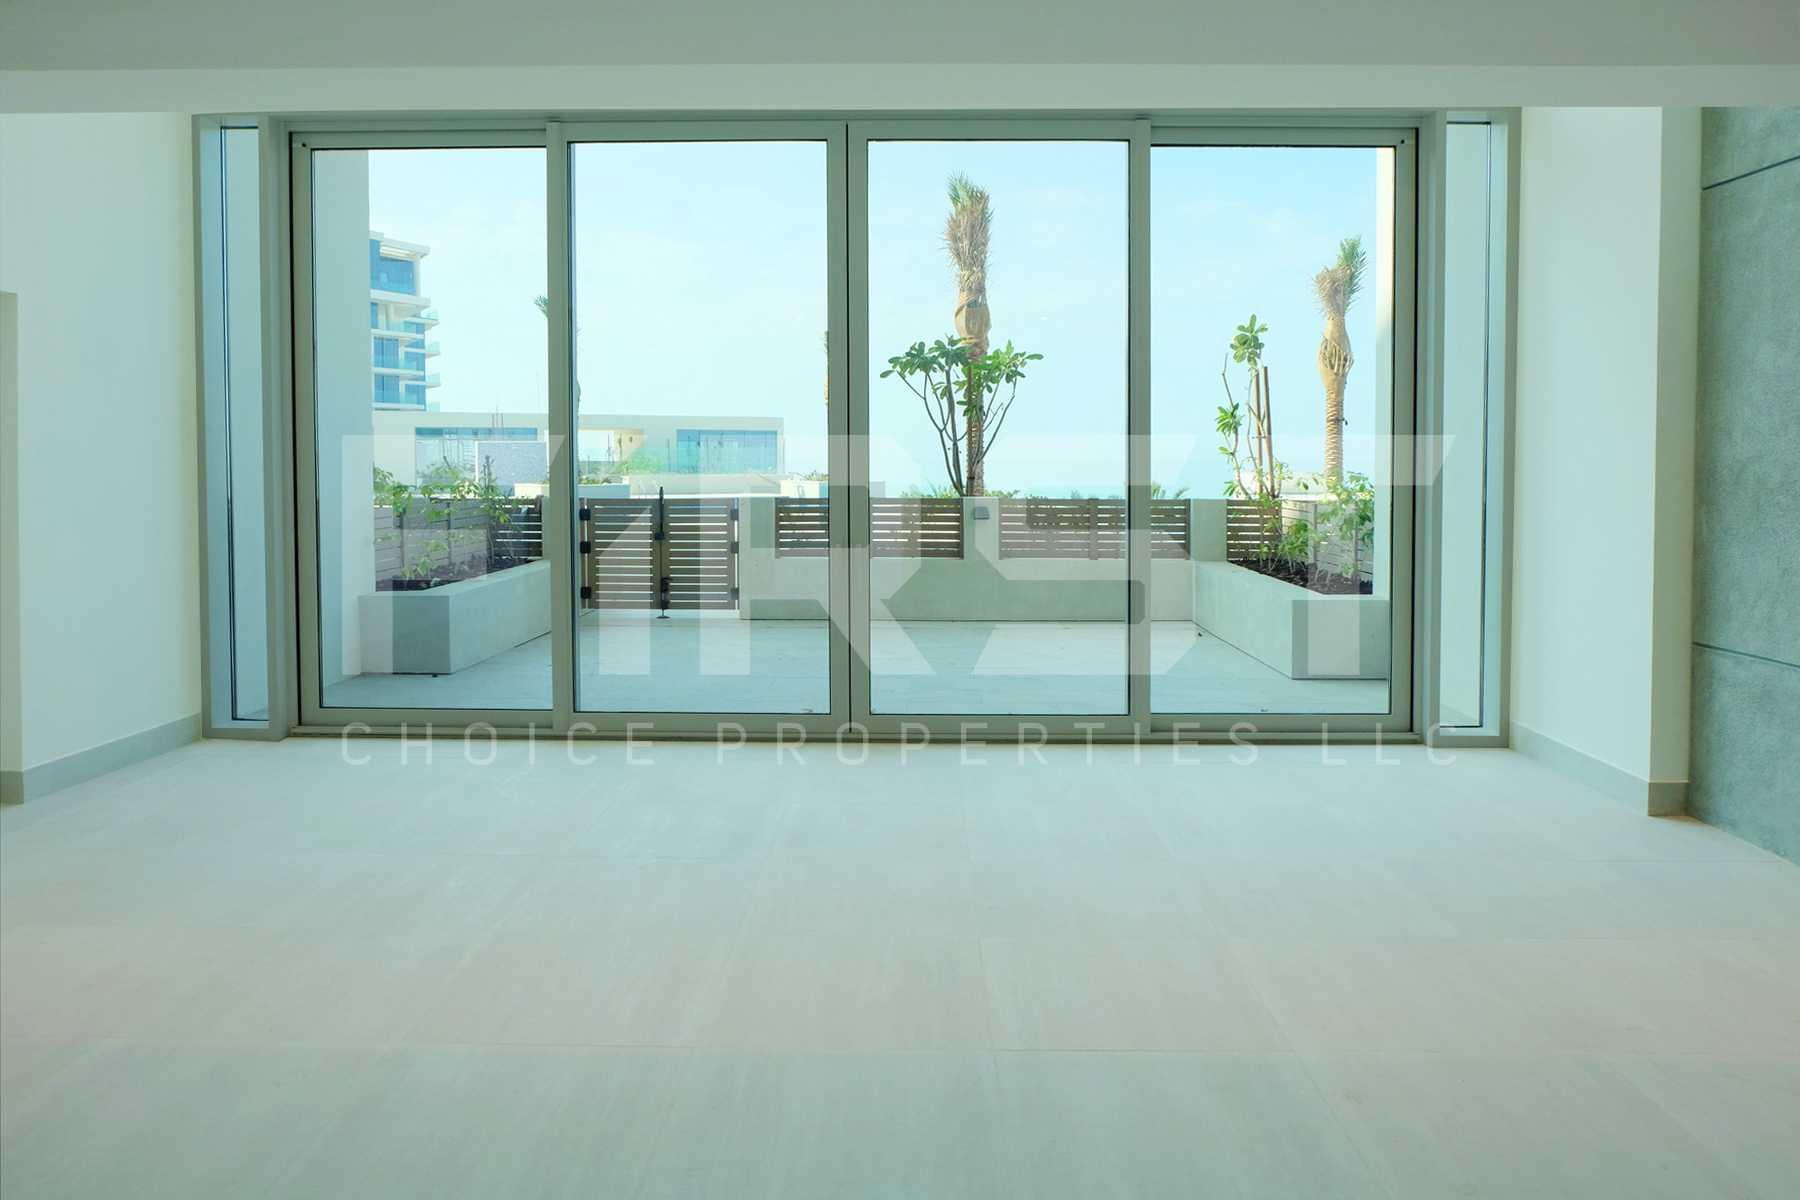 Internal Photo of 1 Bedroom Loft Apartment in Mamsha Al Saadiyat Island Abu Dhabi UAE (18).jpg